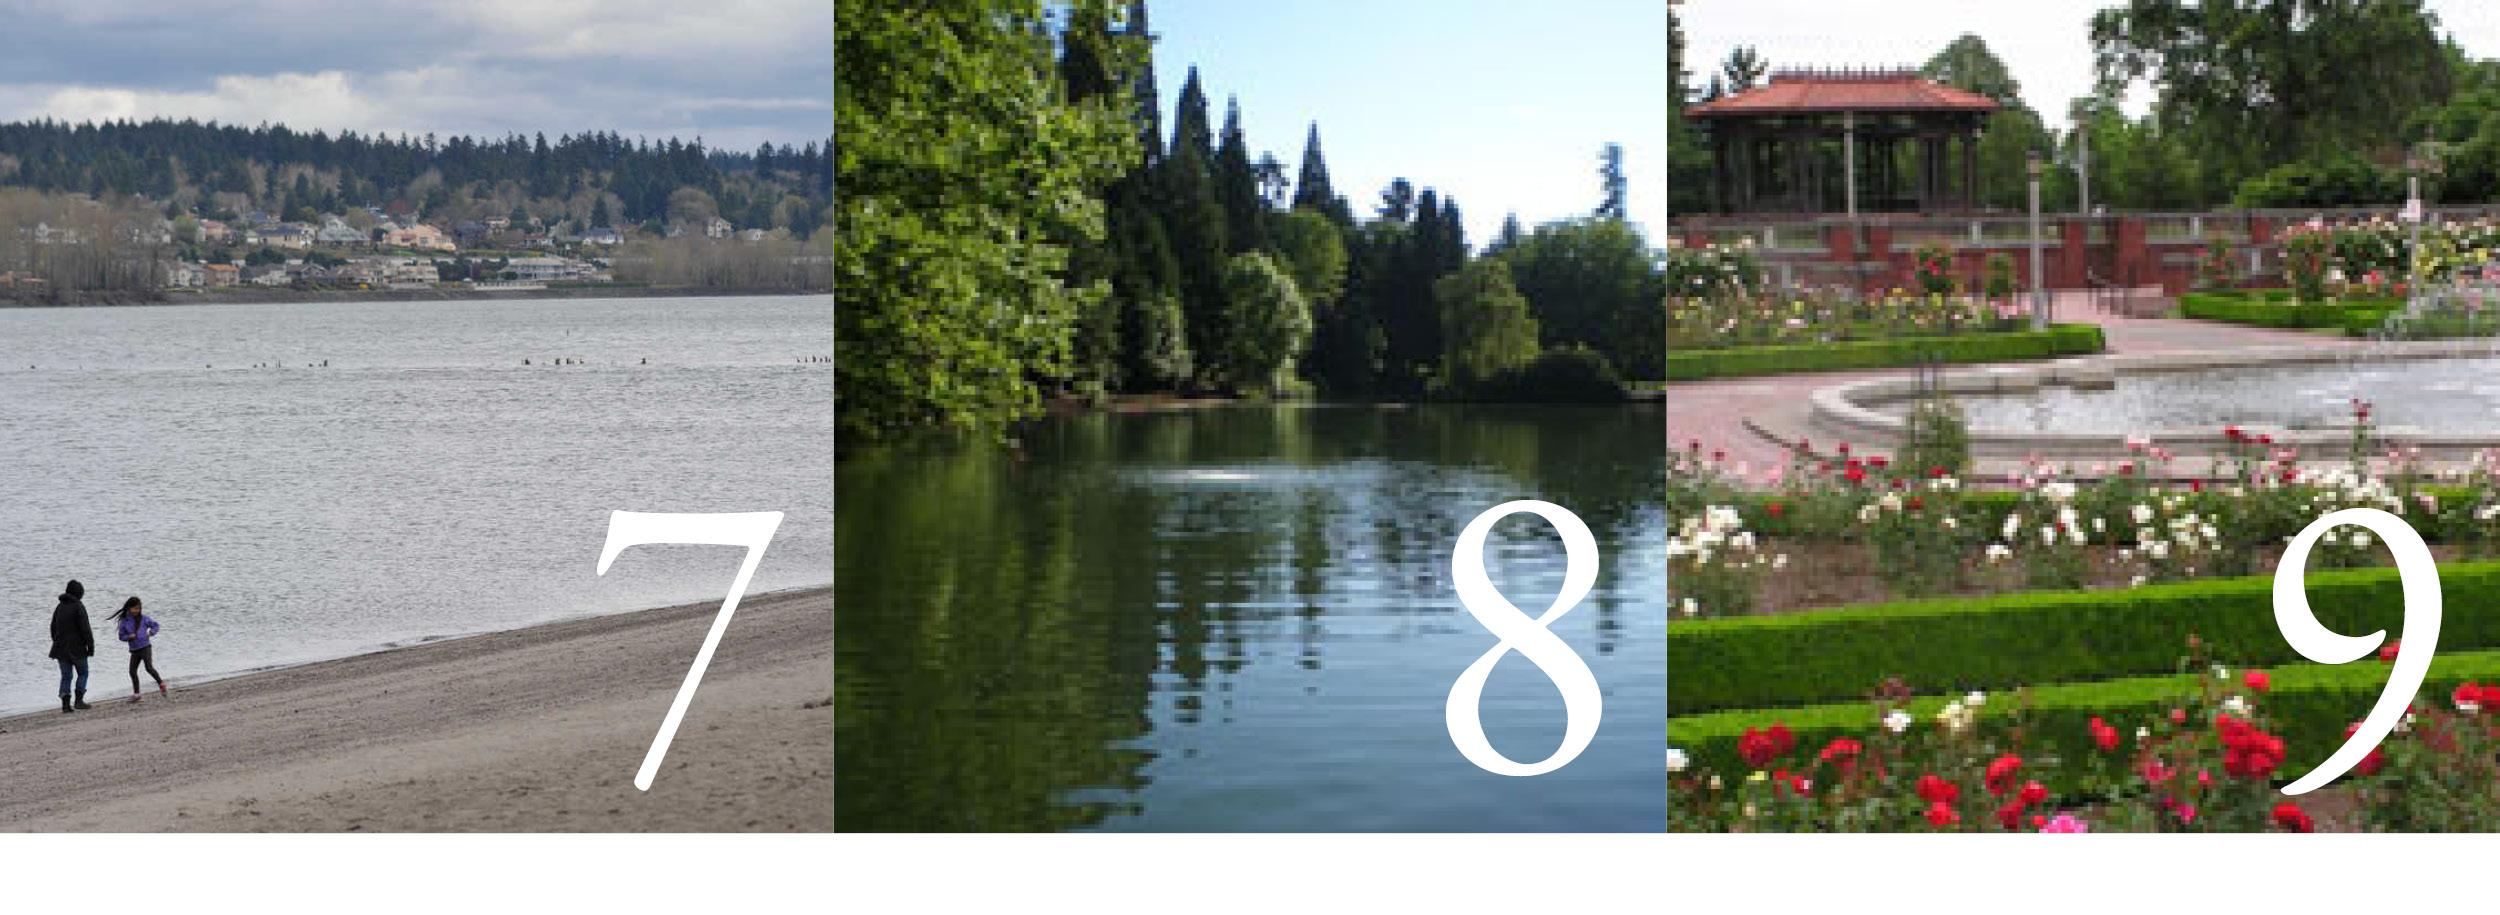 Photo 7 courtesy Metro; Photos 8 and 9 courtesy Portland Parks & Recreation